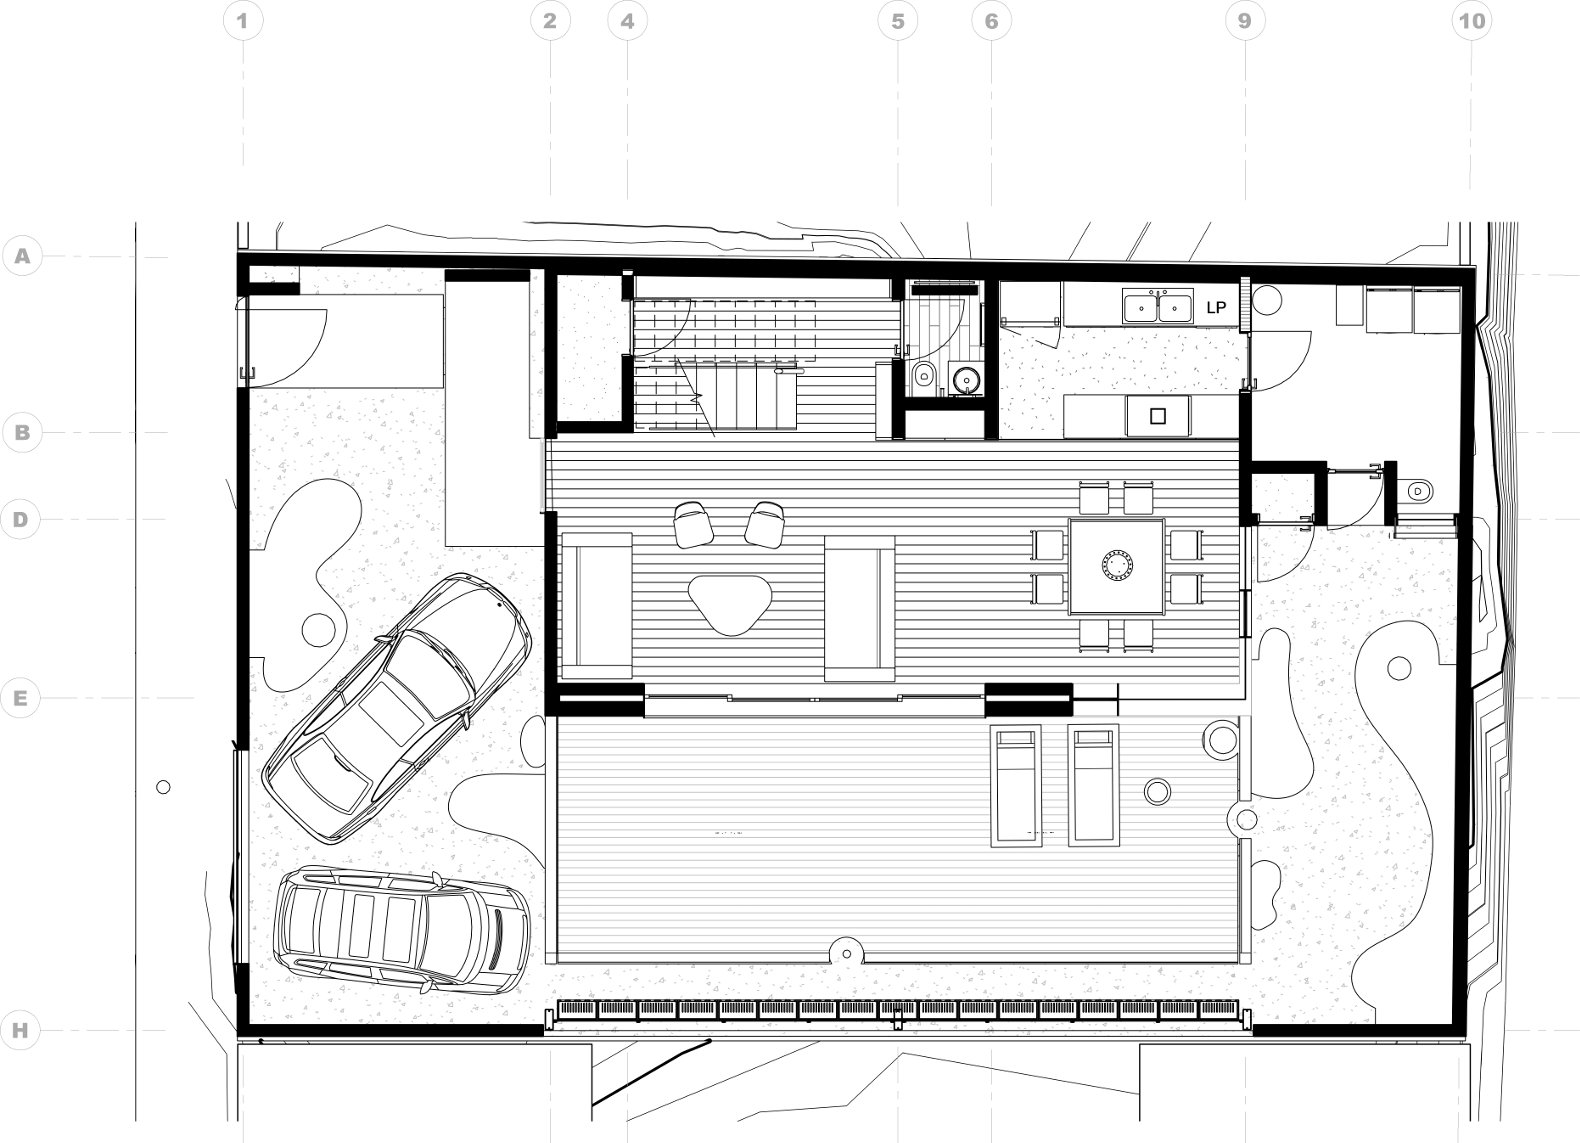 Sanpan Wiring Diagram Diagrams Princecraft 26 Images Automotive Residential Electrical